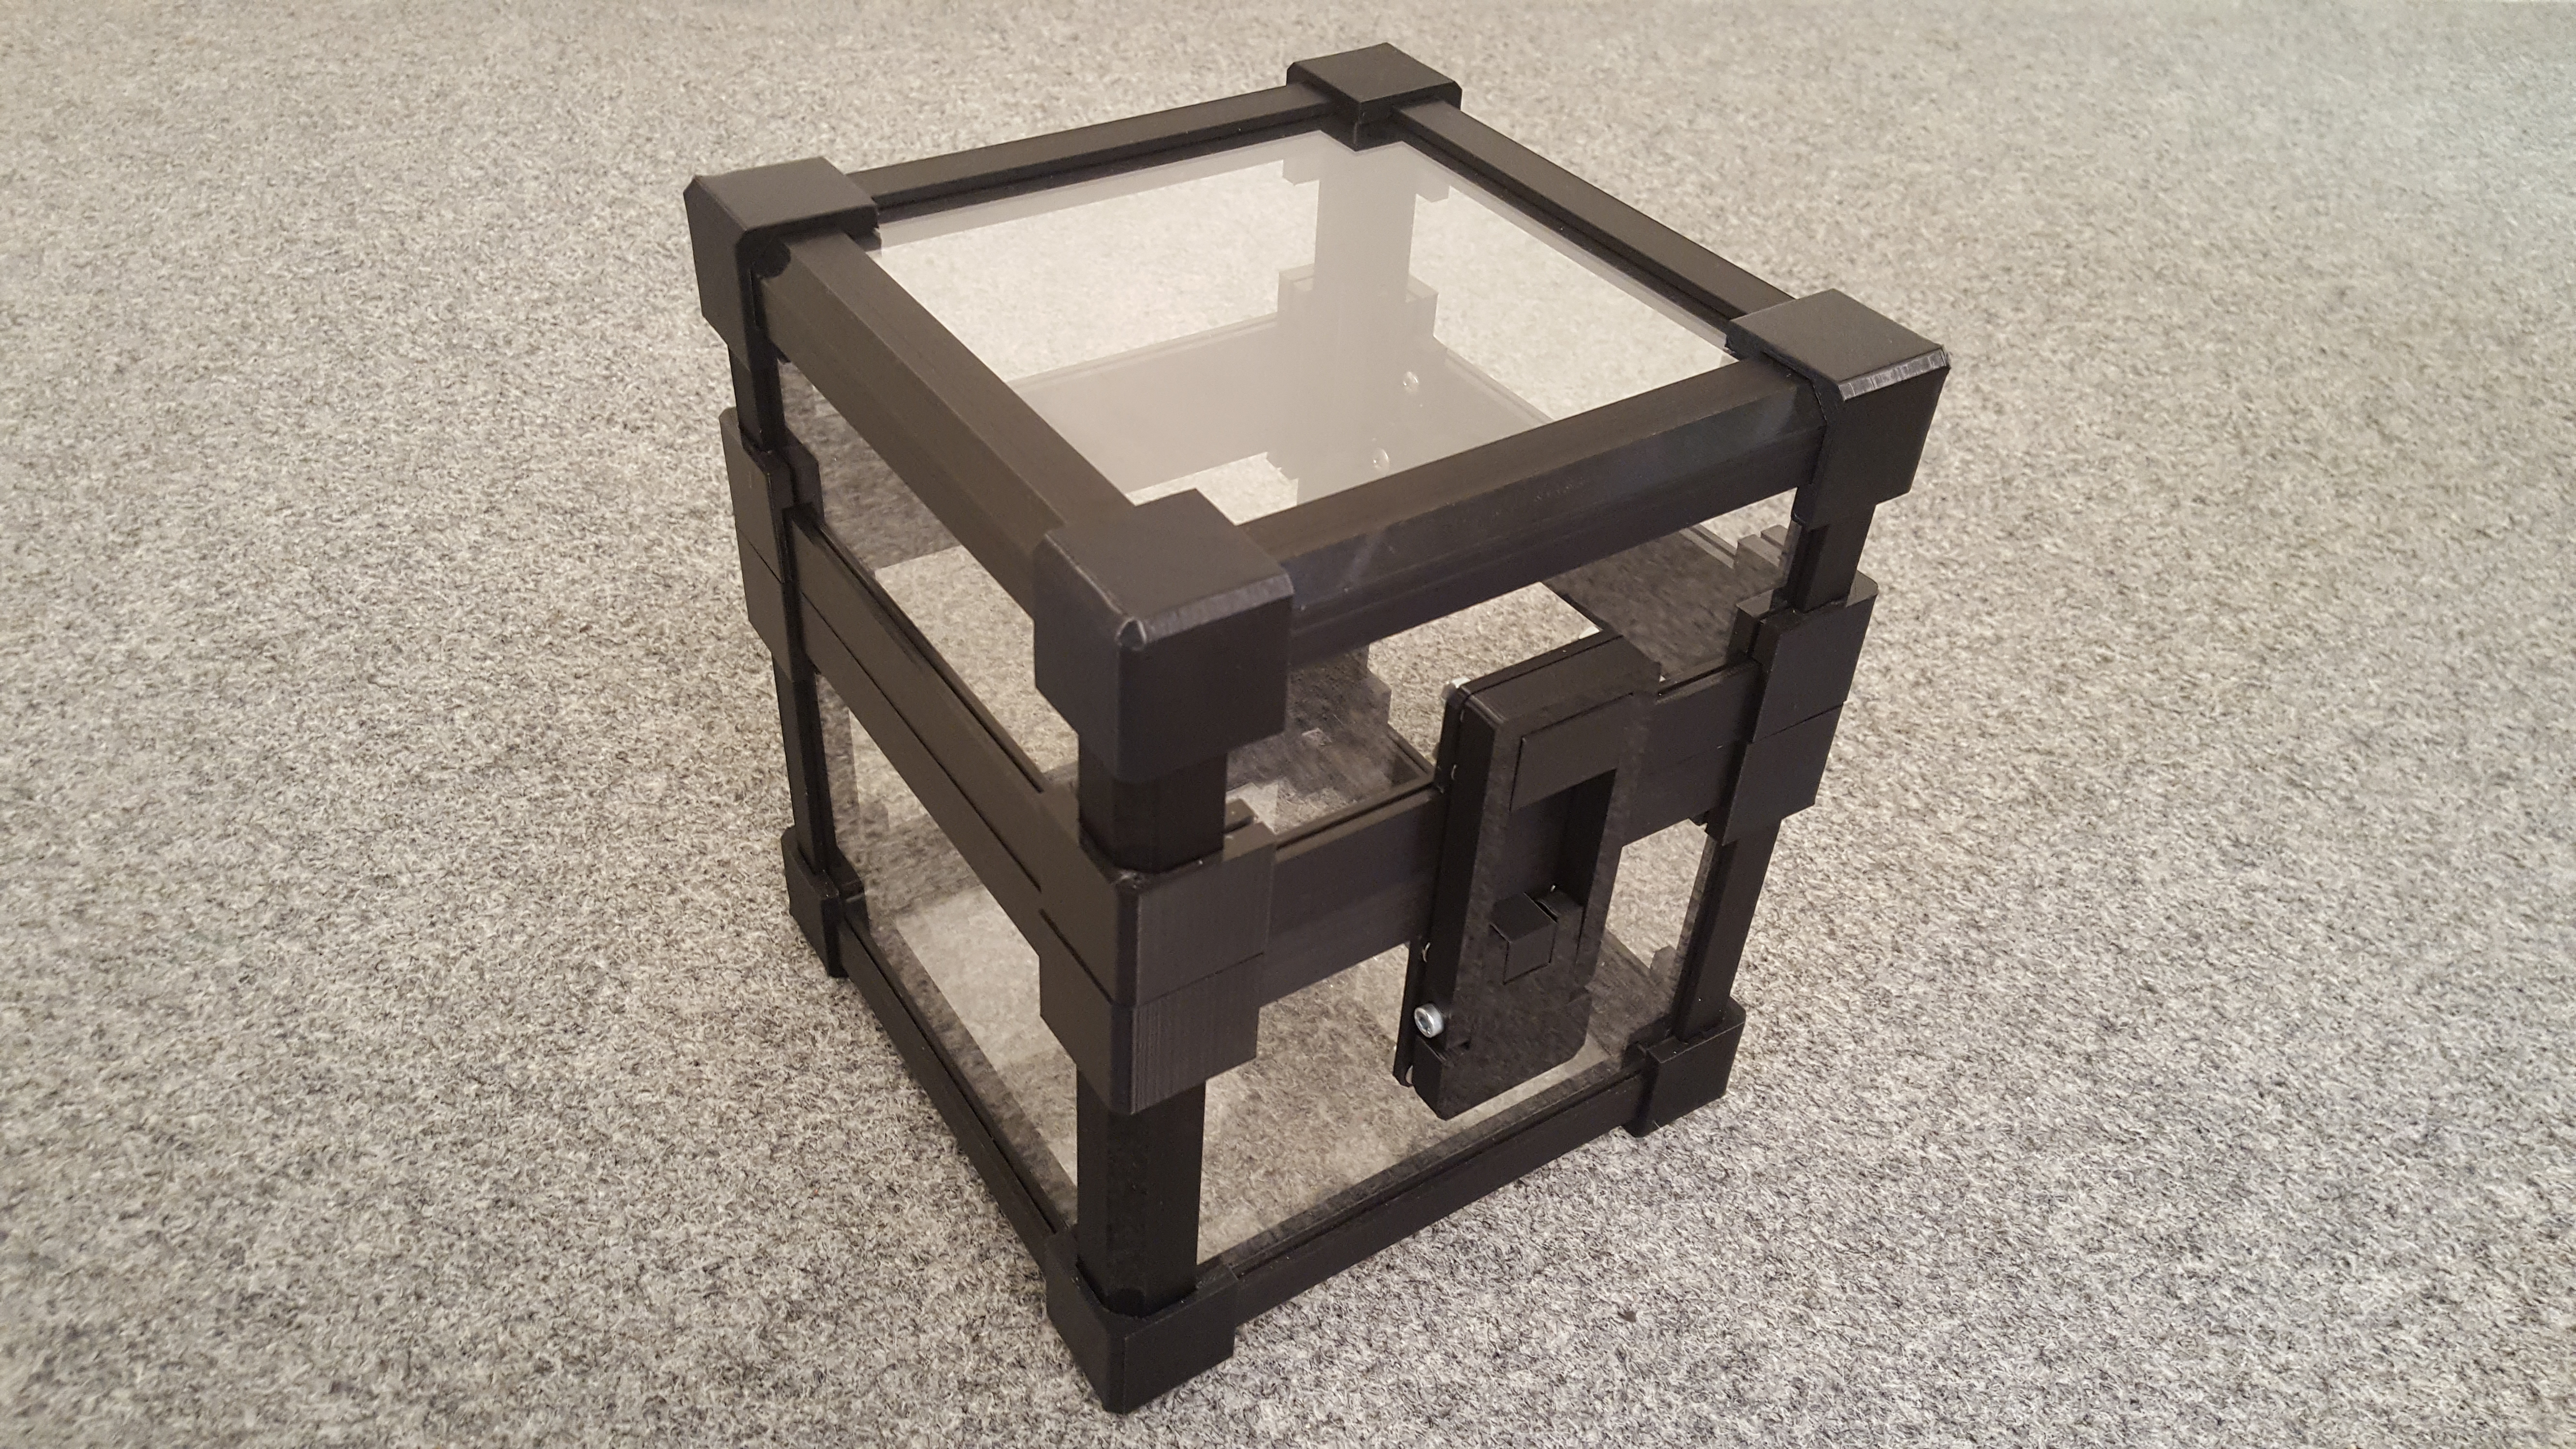 20190818_164633.jpg Download STL file LazyMans Box • Model to 3D print, Job